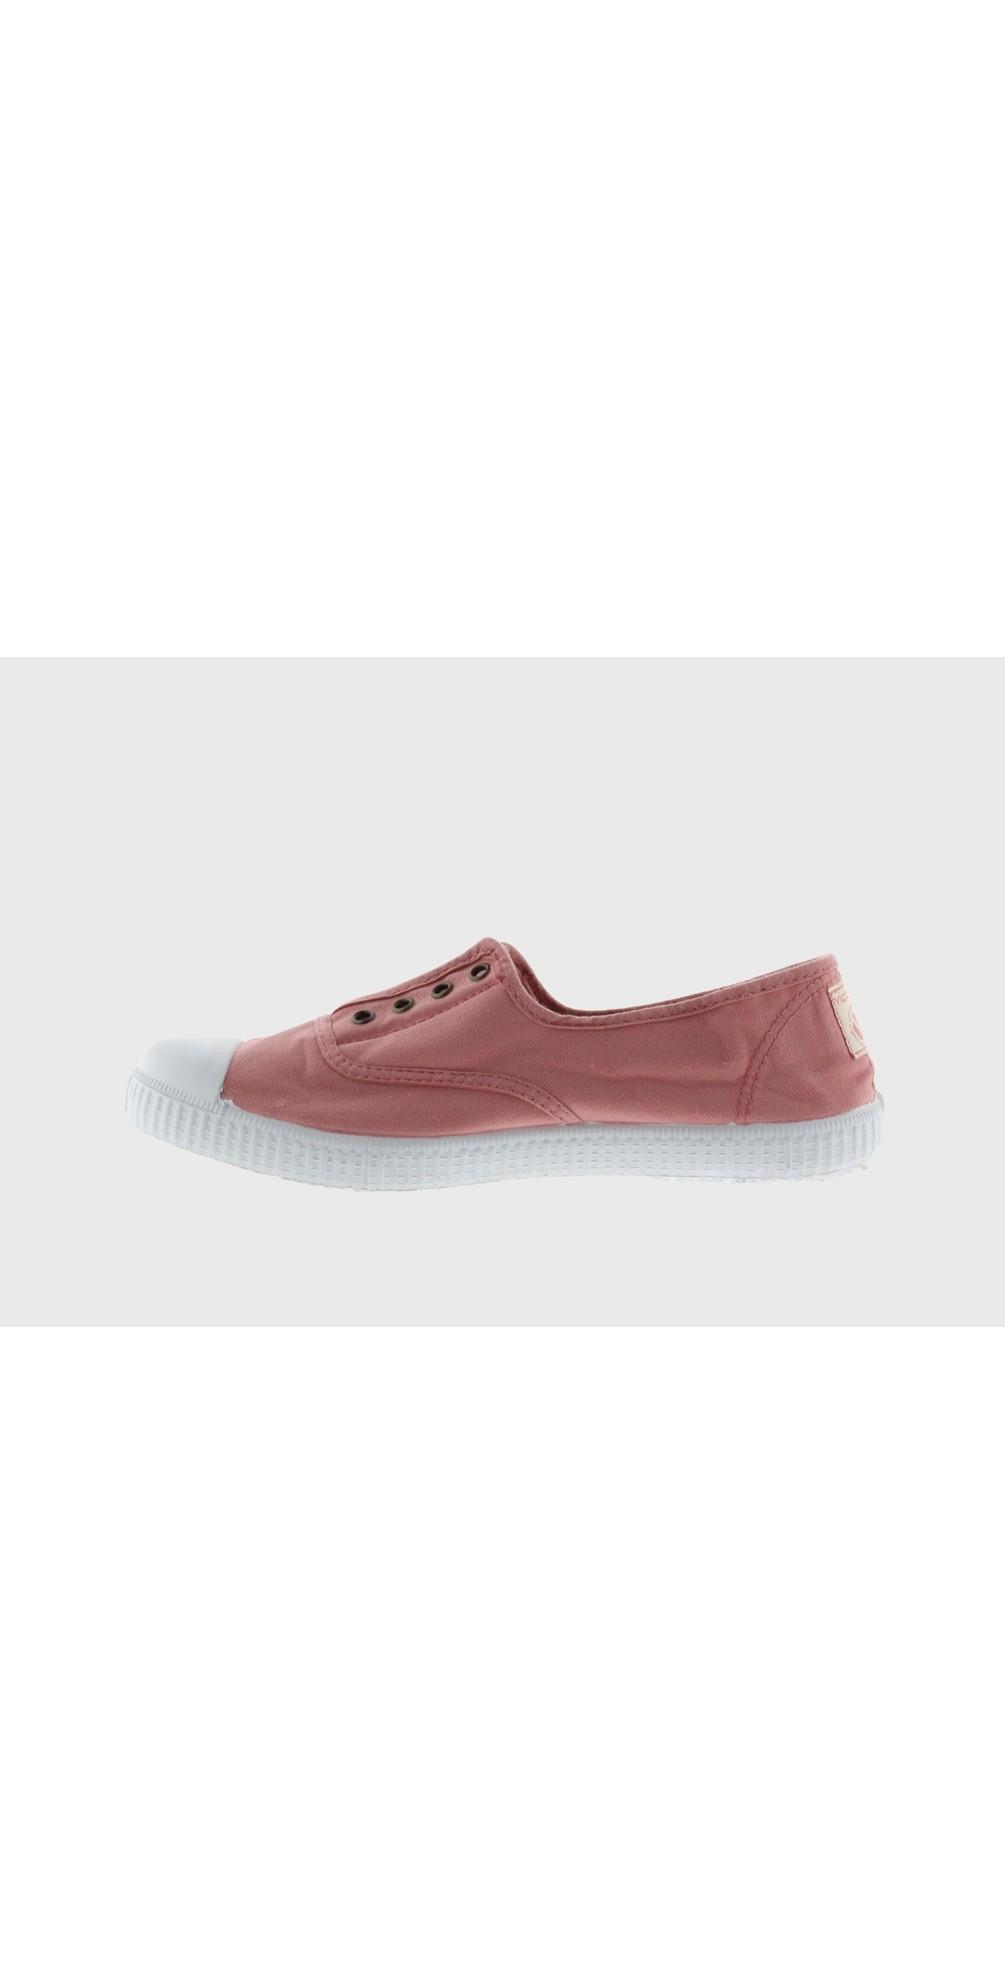 Dora Pink Organic Cotton Washable No Lace Pump main image